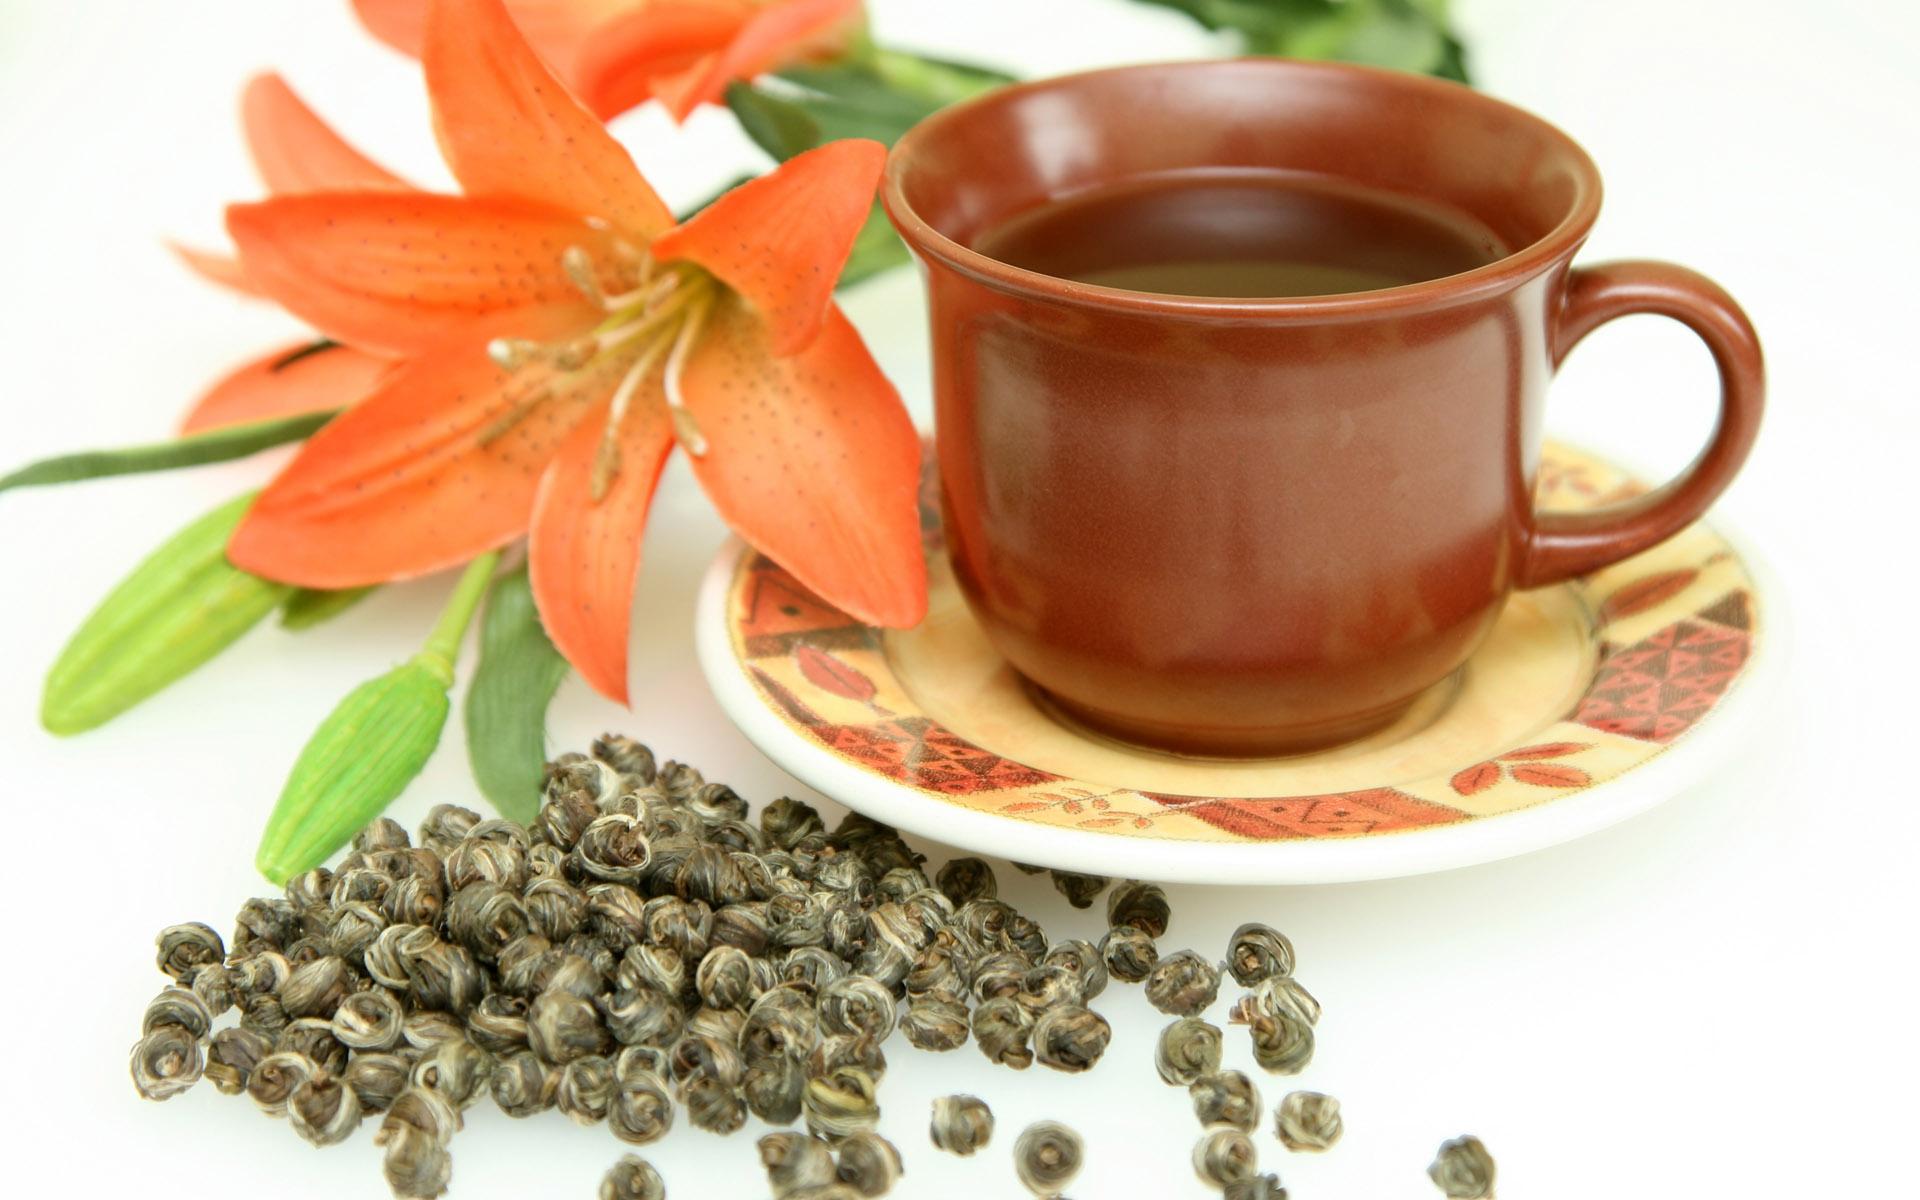 food coffee wallpaper - photo #44